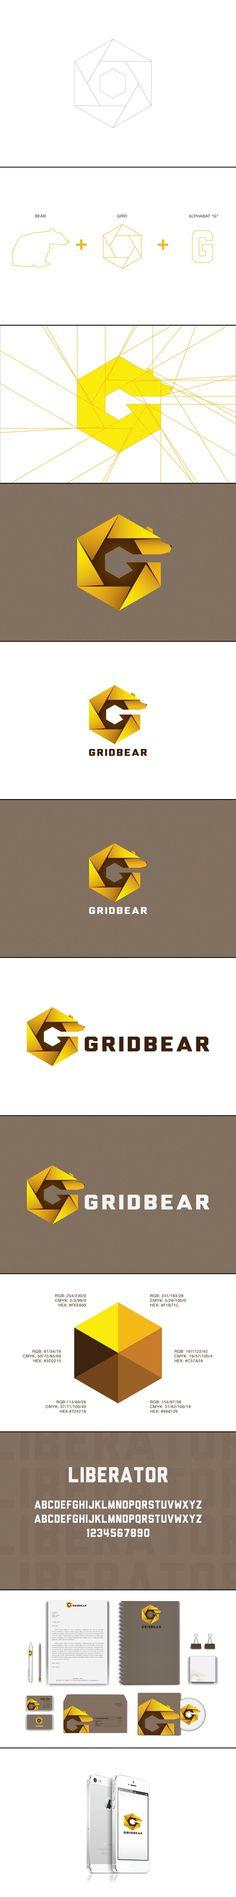 Gridbear Logo Design and Brand Identity.